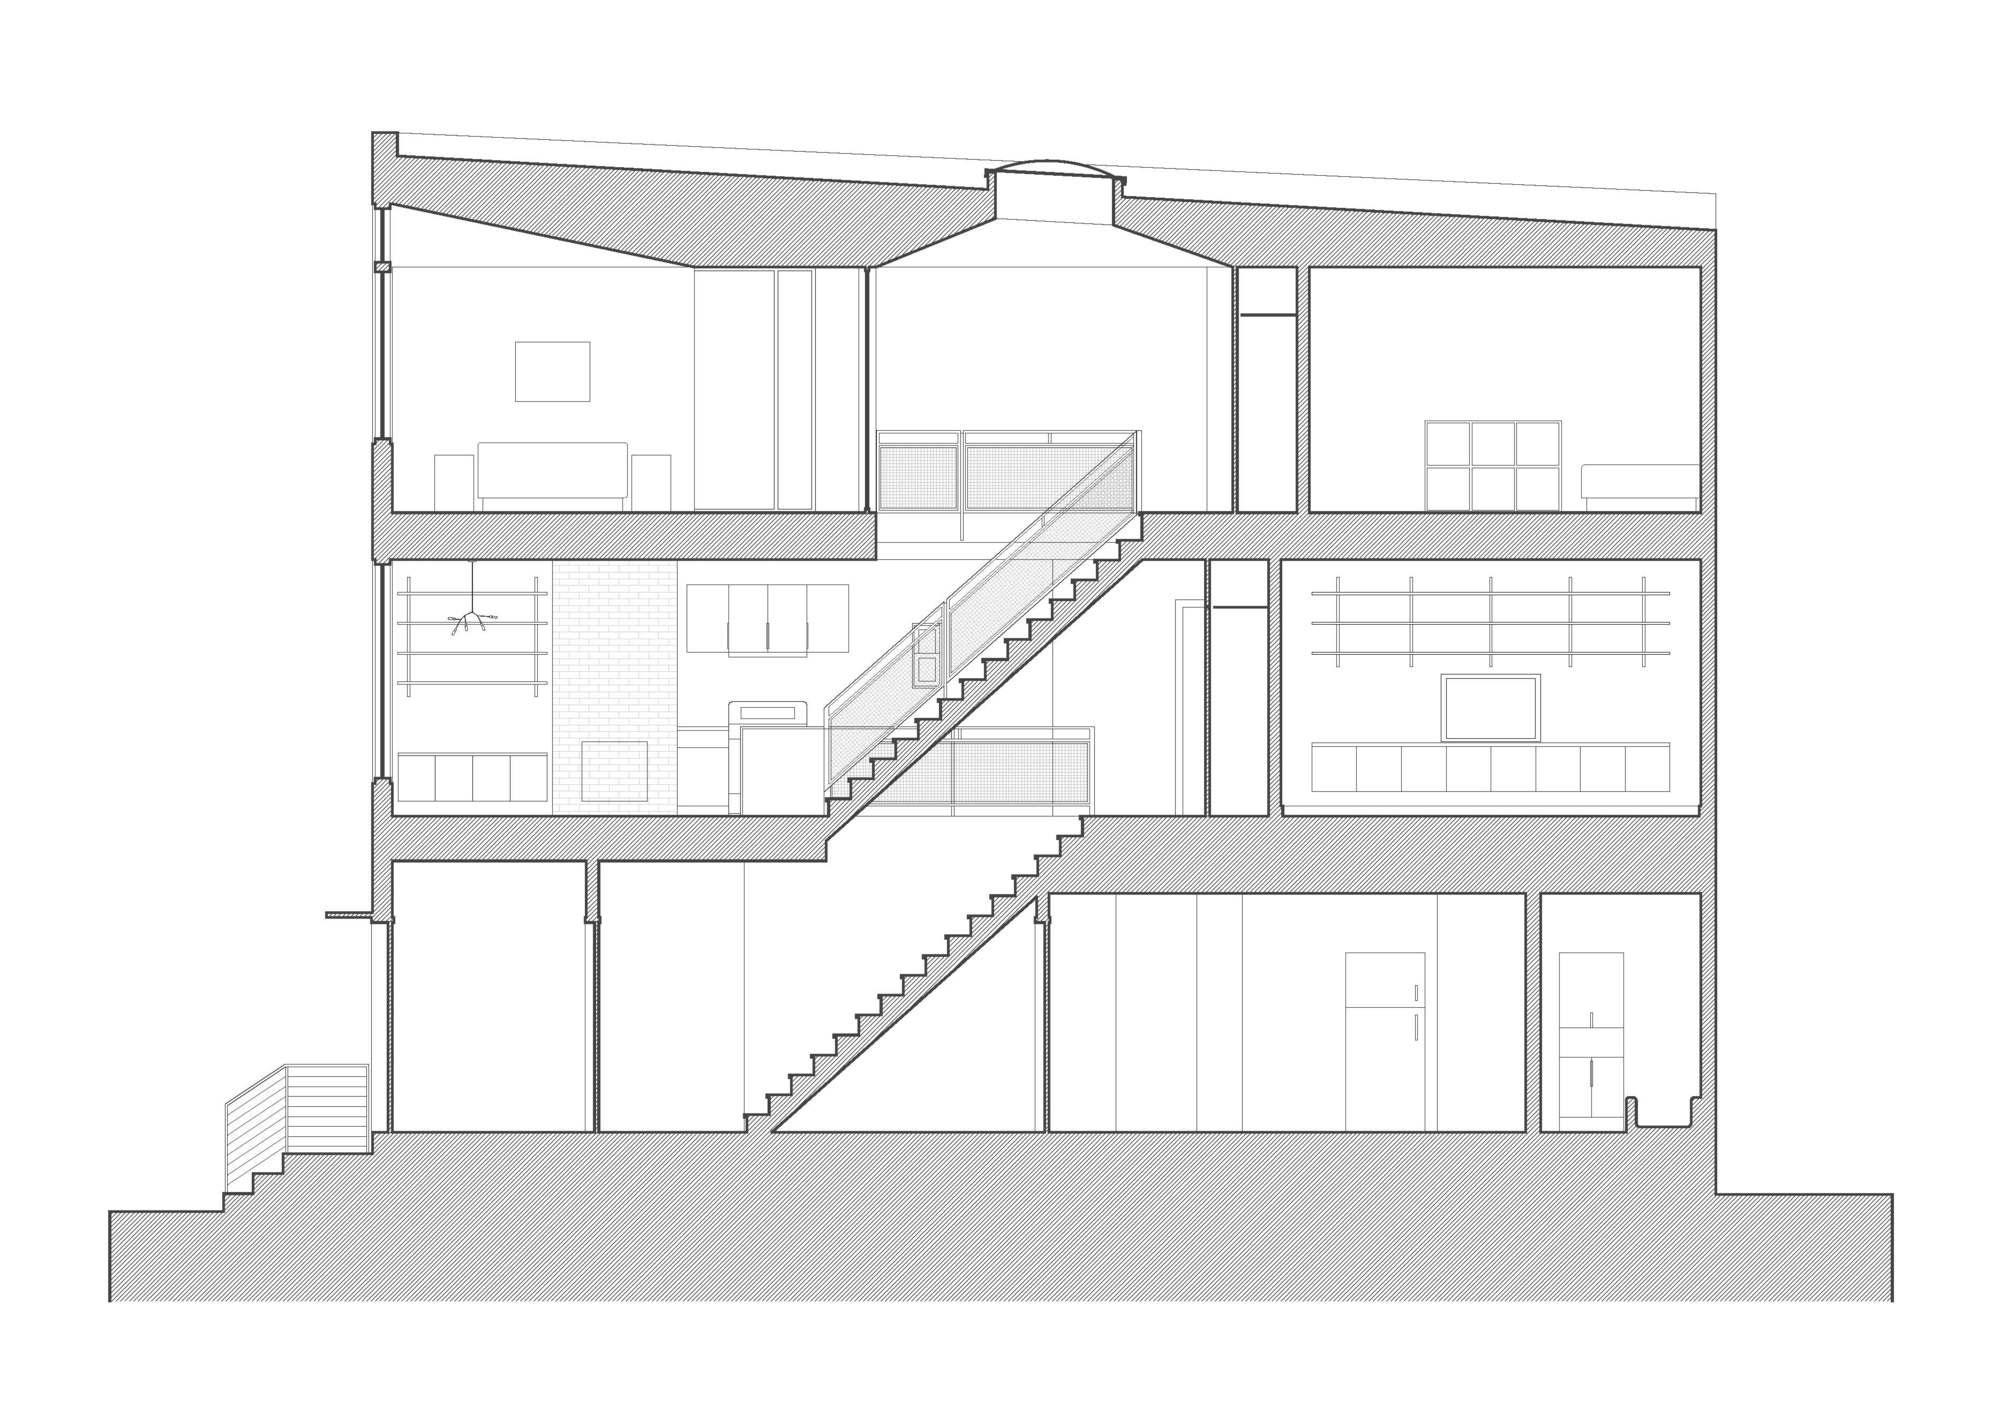 Gutman-Umansky Townhouse by Etelamaki Architecture-17